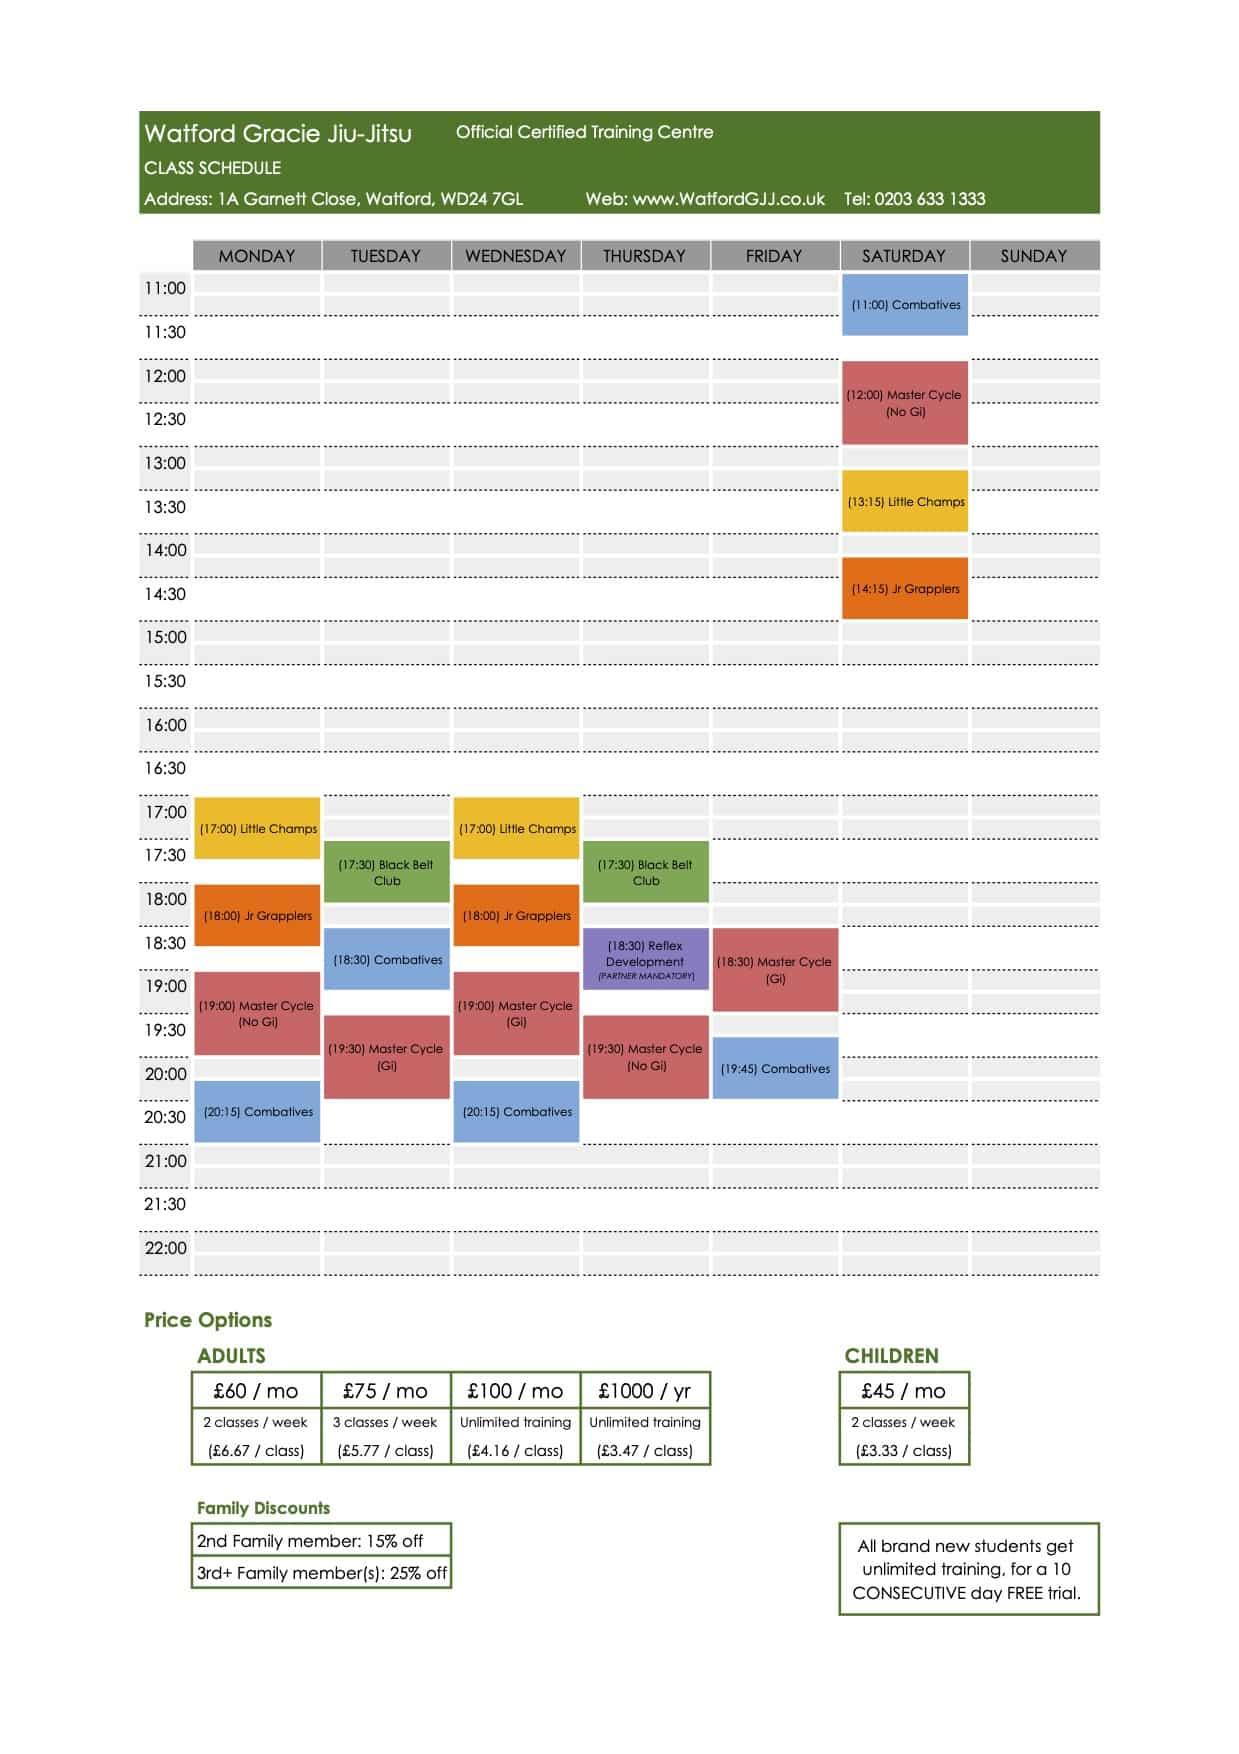 Watford GJJ Schedule May 2021